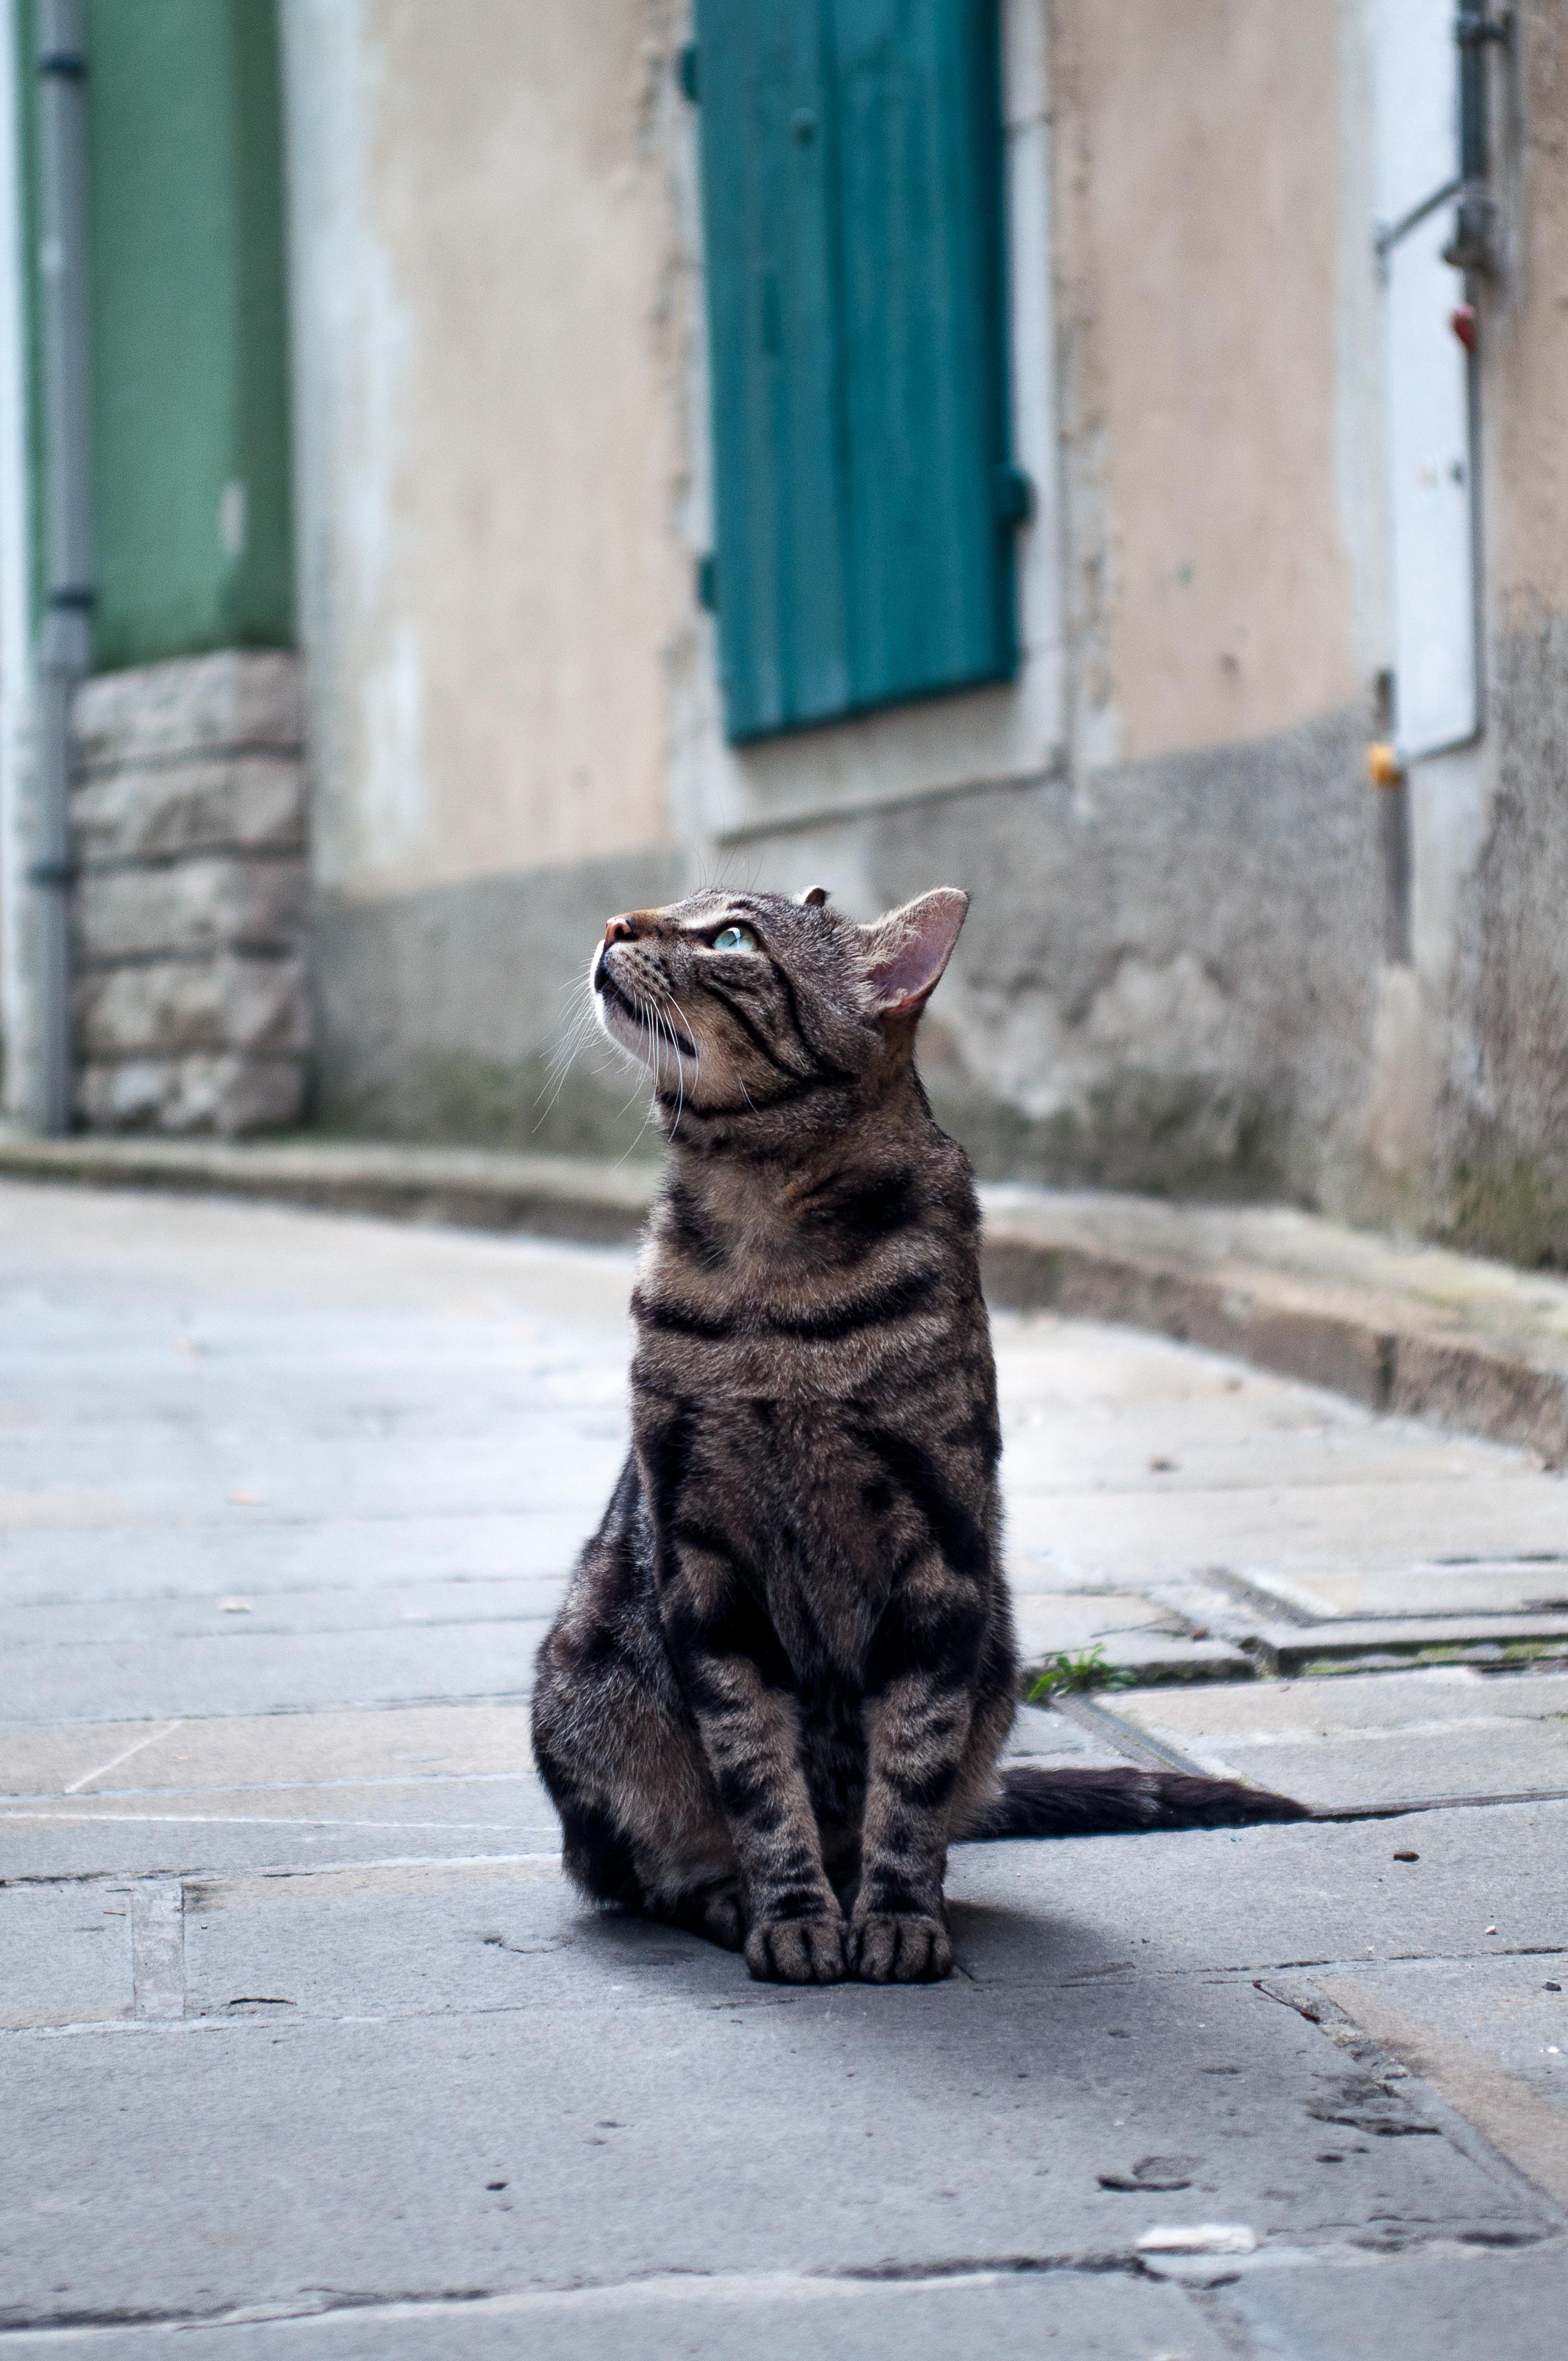 Cat staring, Animal, Cat, Fur, Furball, HQ Photo